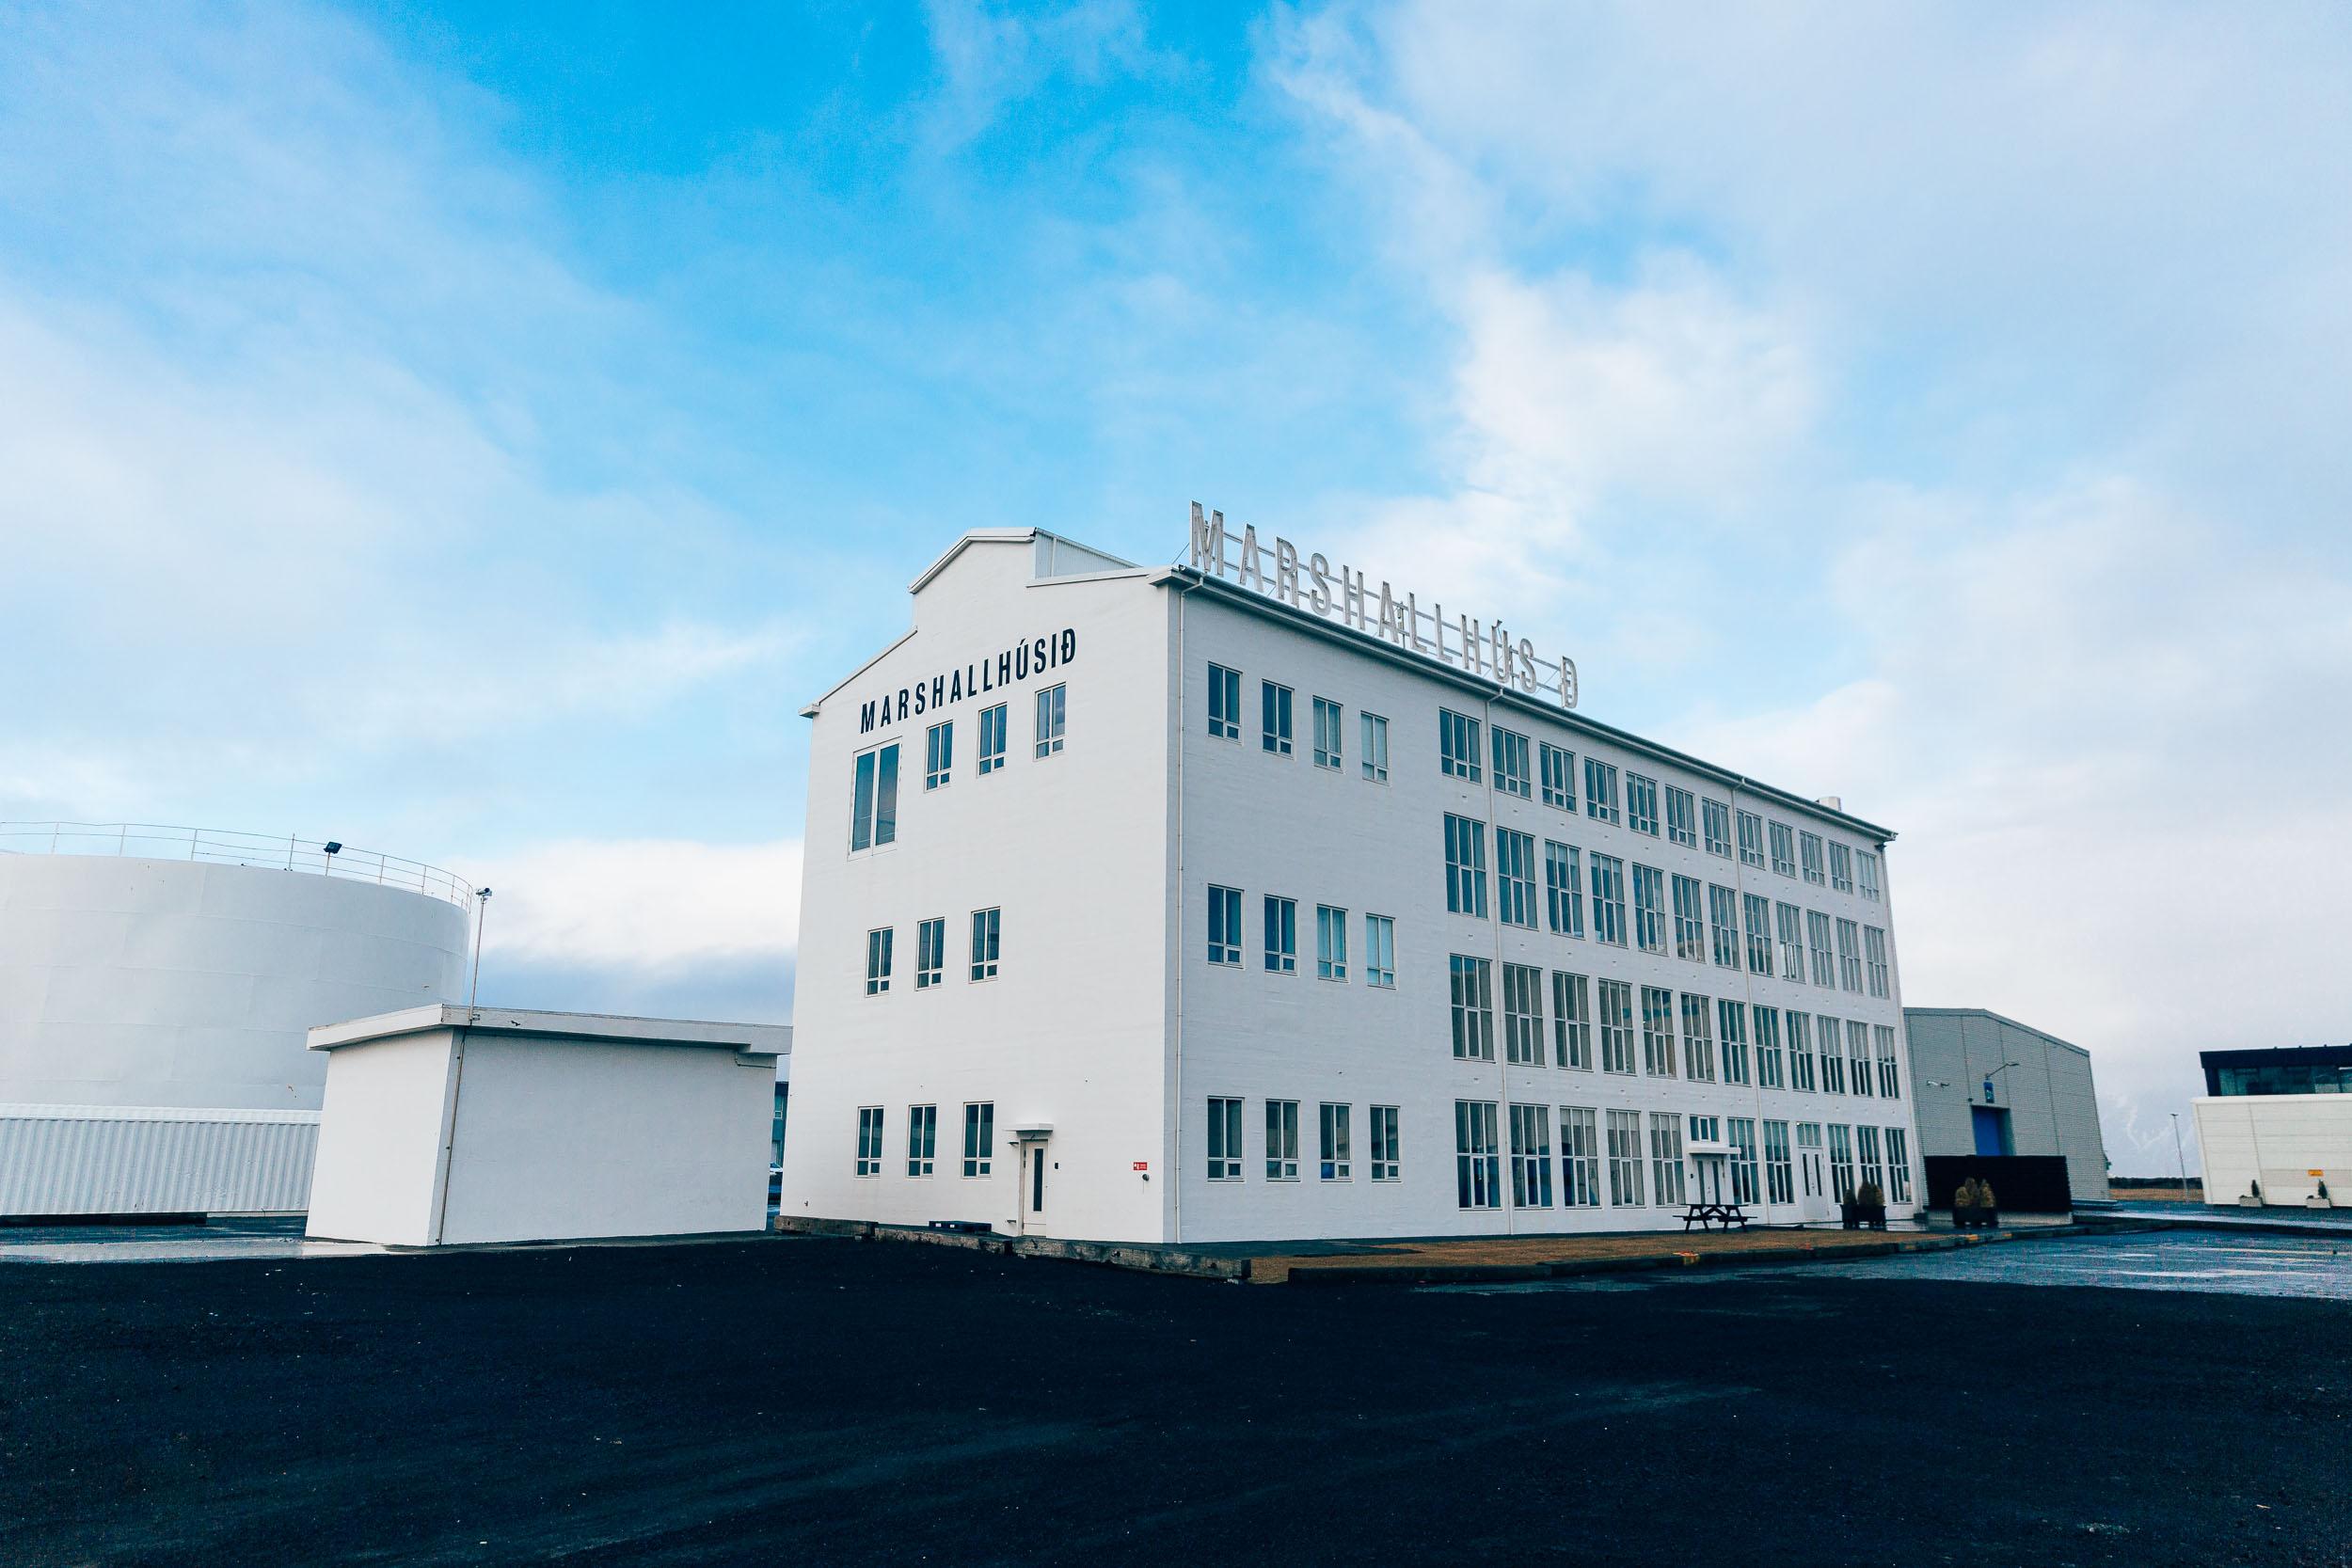 02_2019_Iceland-149.jpg